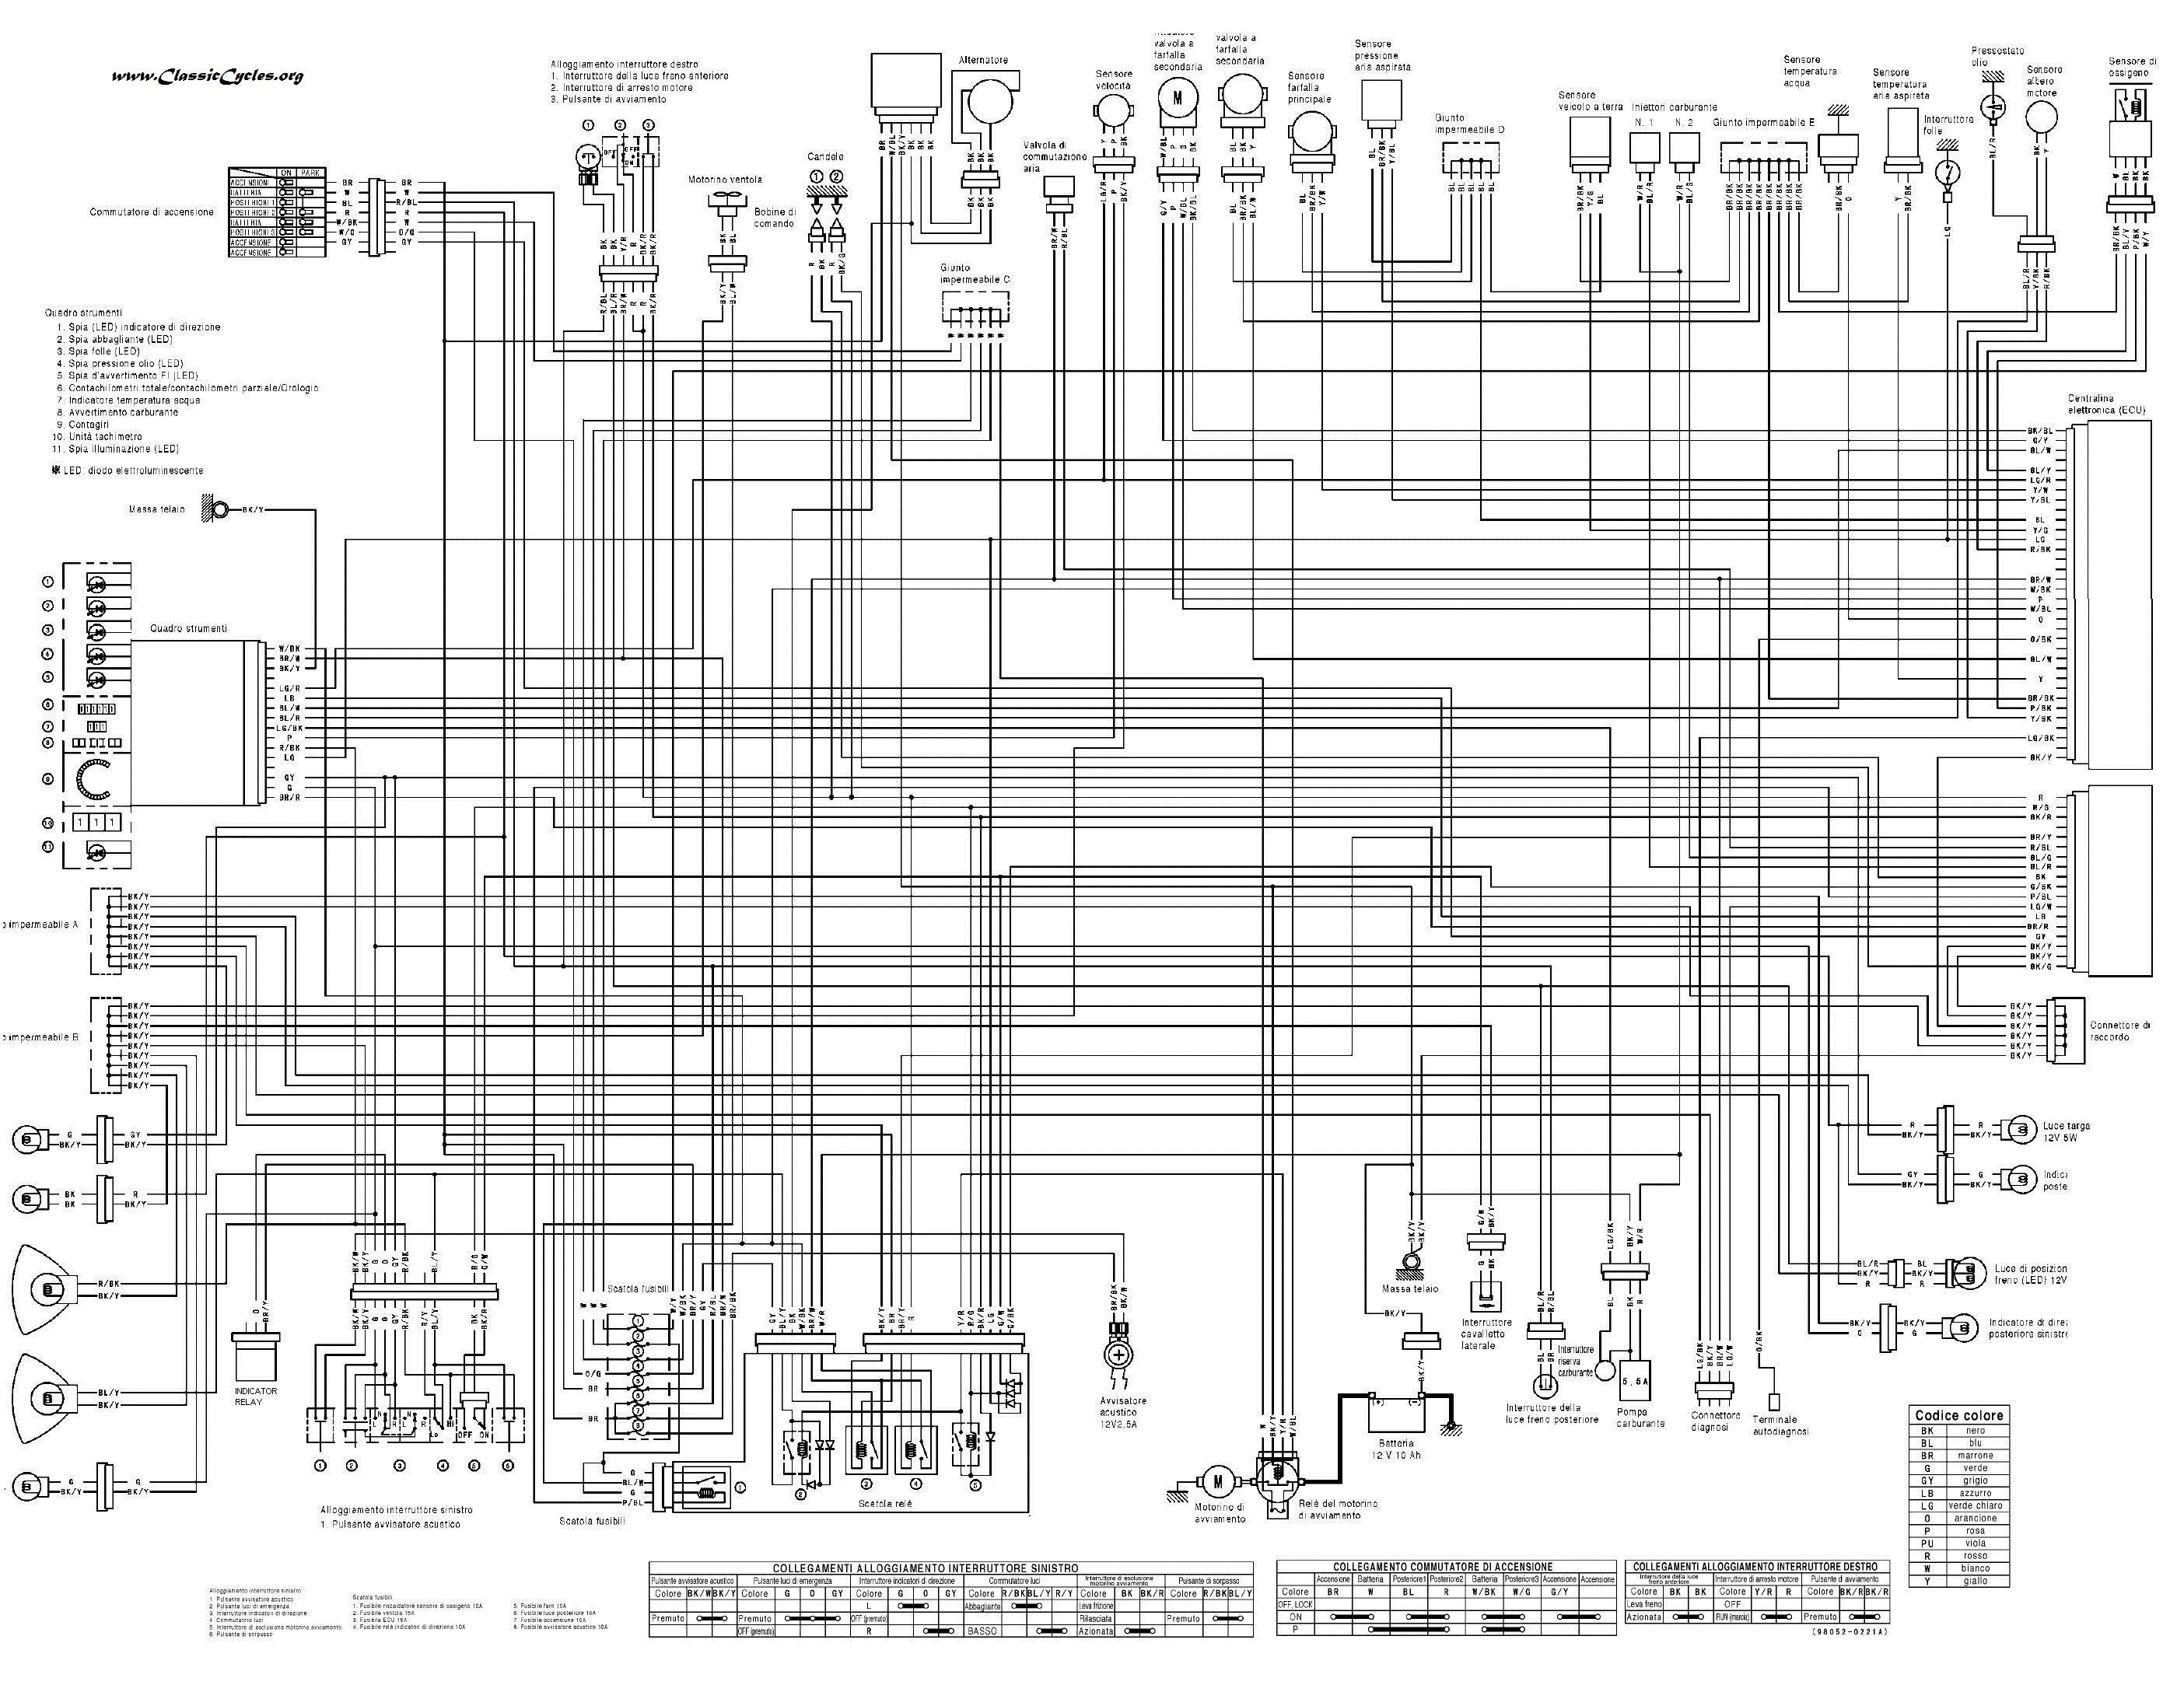 2000 Dodge Durango Engine Diagram 2003 Emissions Stratus Free Download Wiring Of